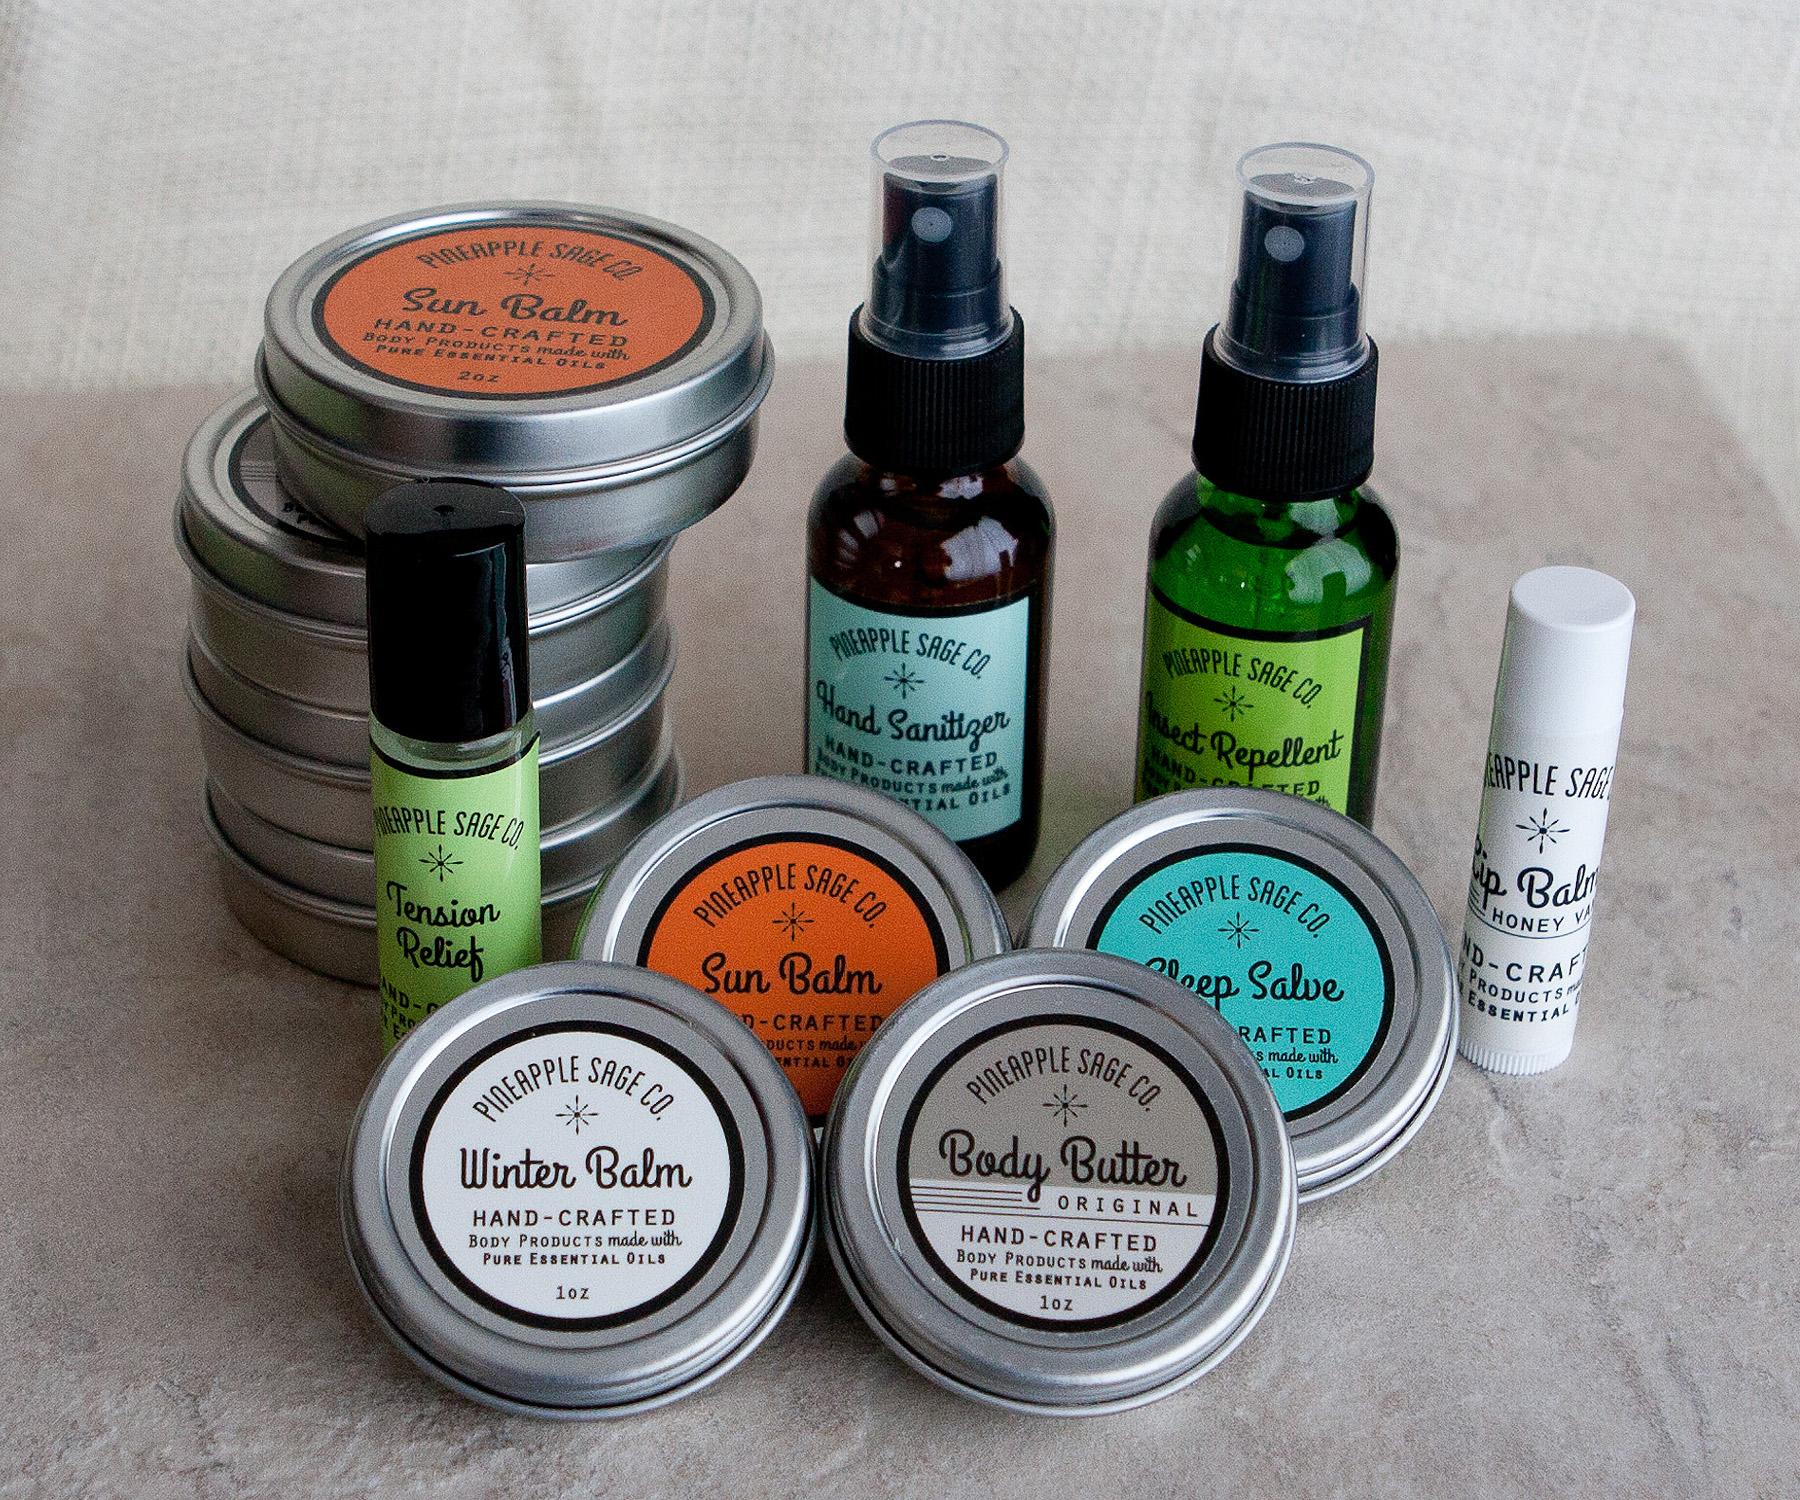 Marketing Studio - Pineapple Sage product line